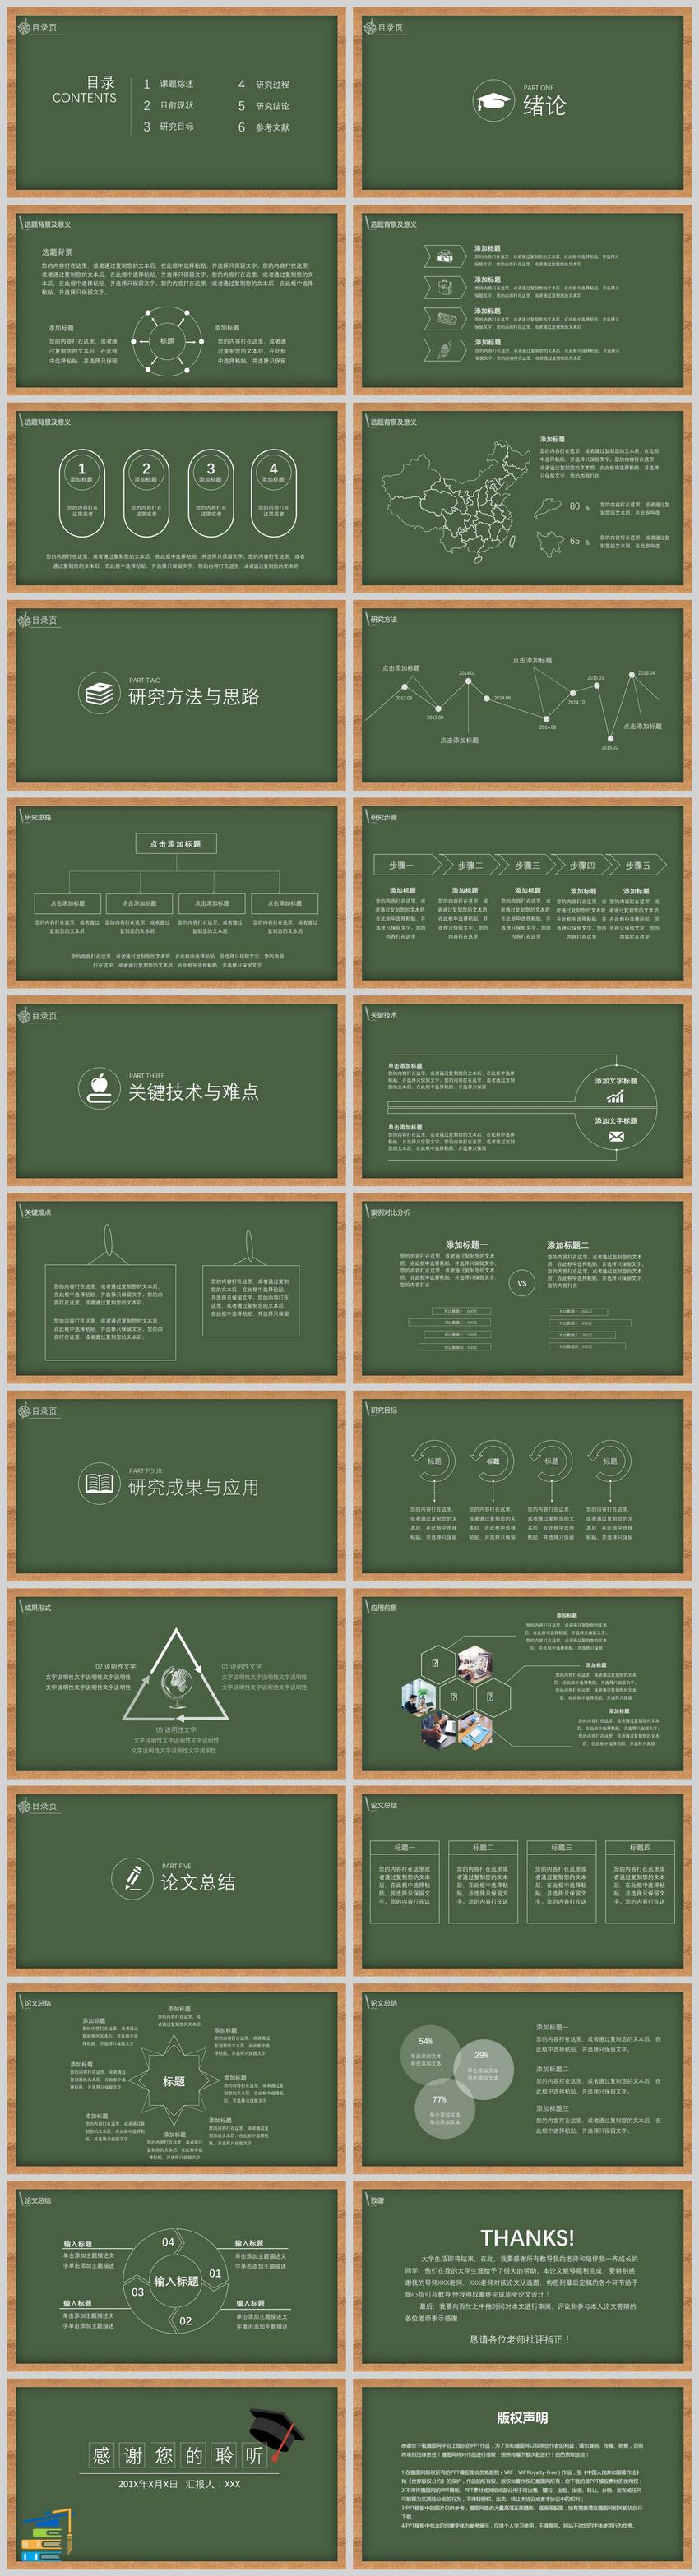 Blackboard Background Paper Defense Ppt Template Powerpoint